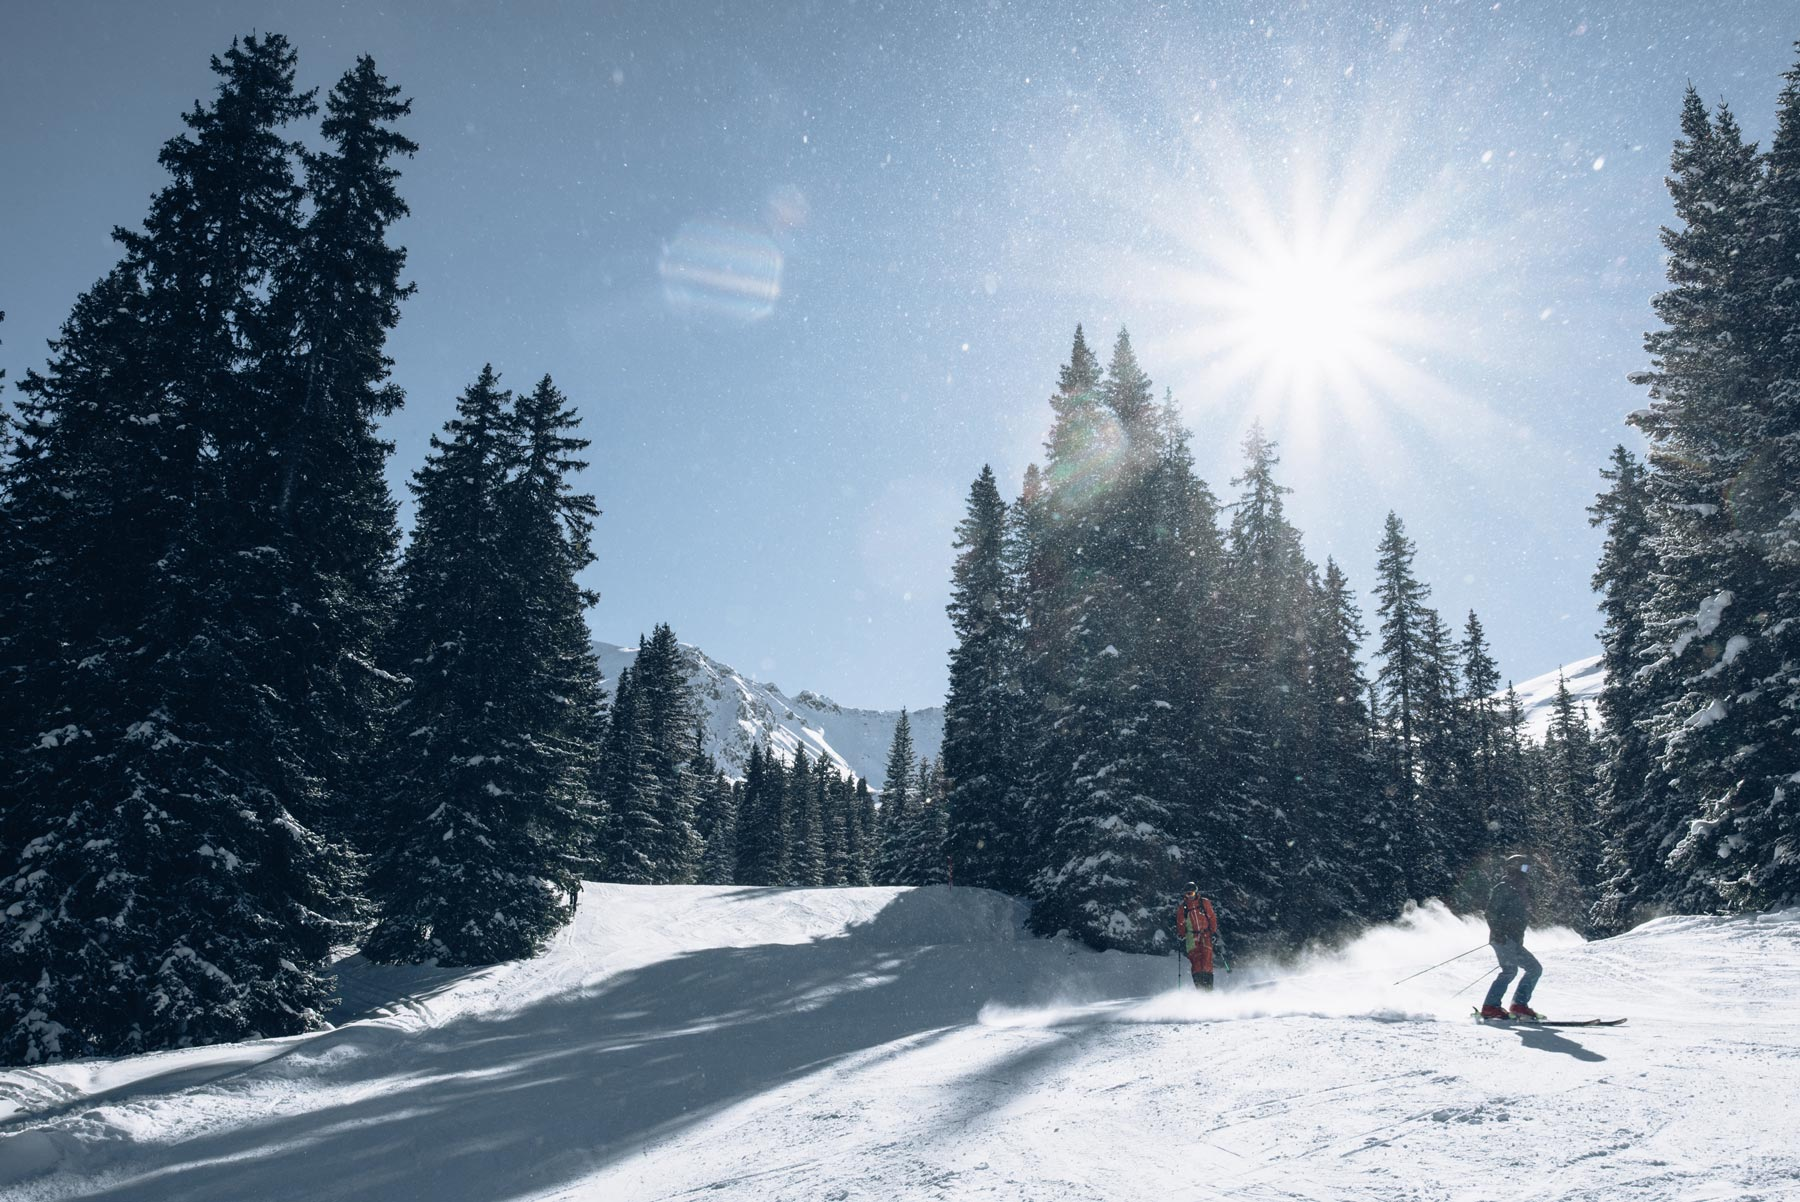 Domaine skiable de Parsenn